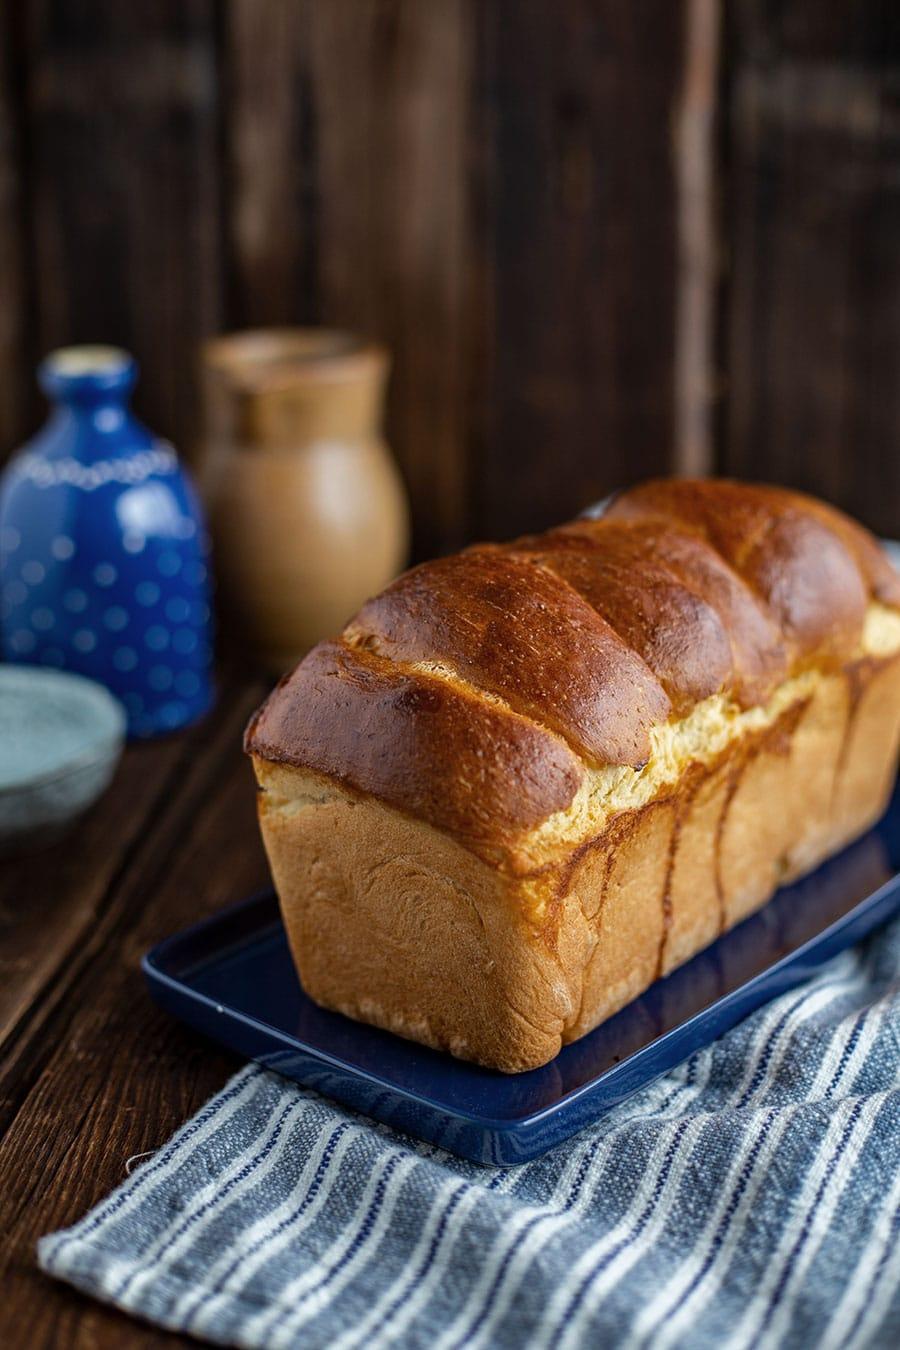 Toastbrot selber backen – Klassisches Toastbrot Rezept mit Hefe